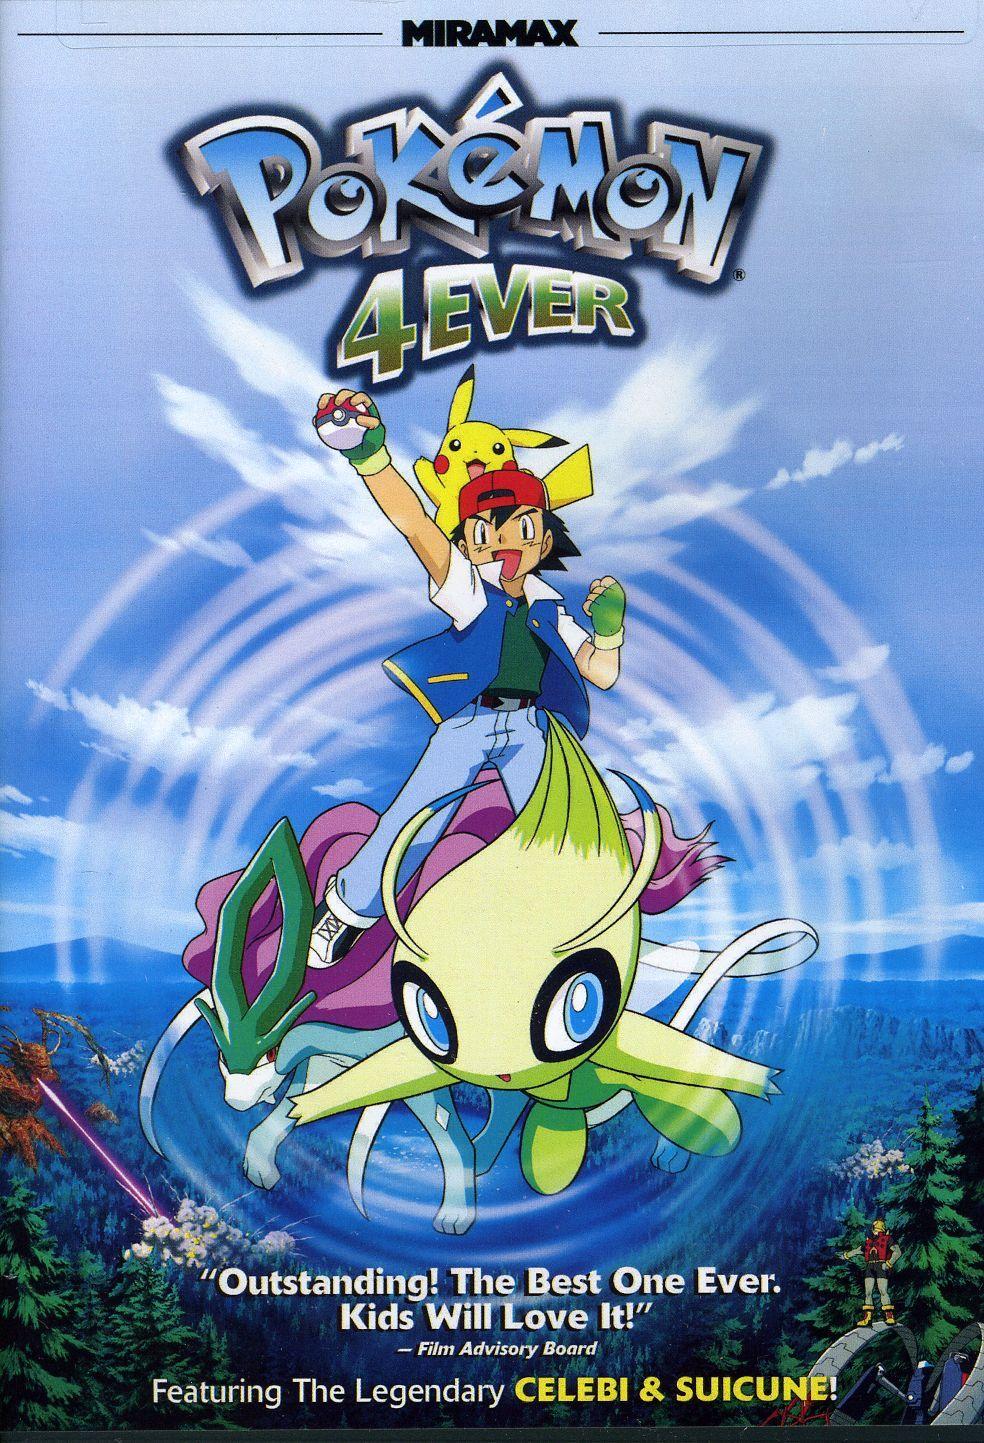 Pokemon 4Ever Celebi Voice of the Forest Pokemon